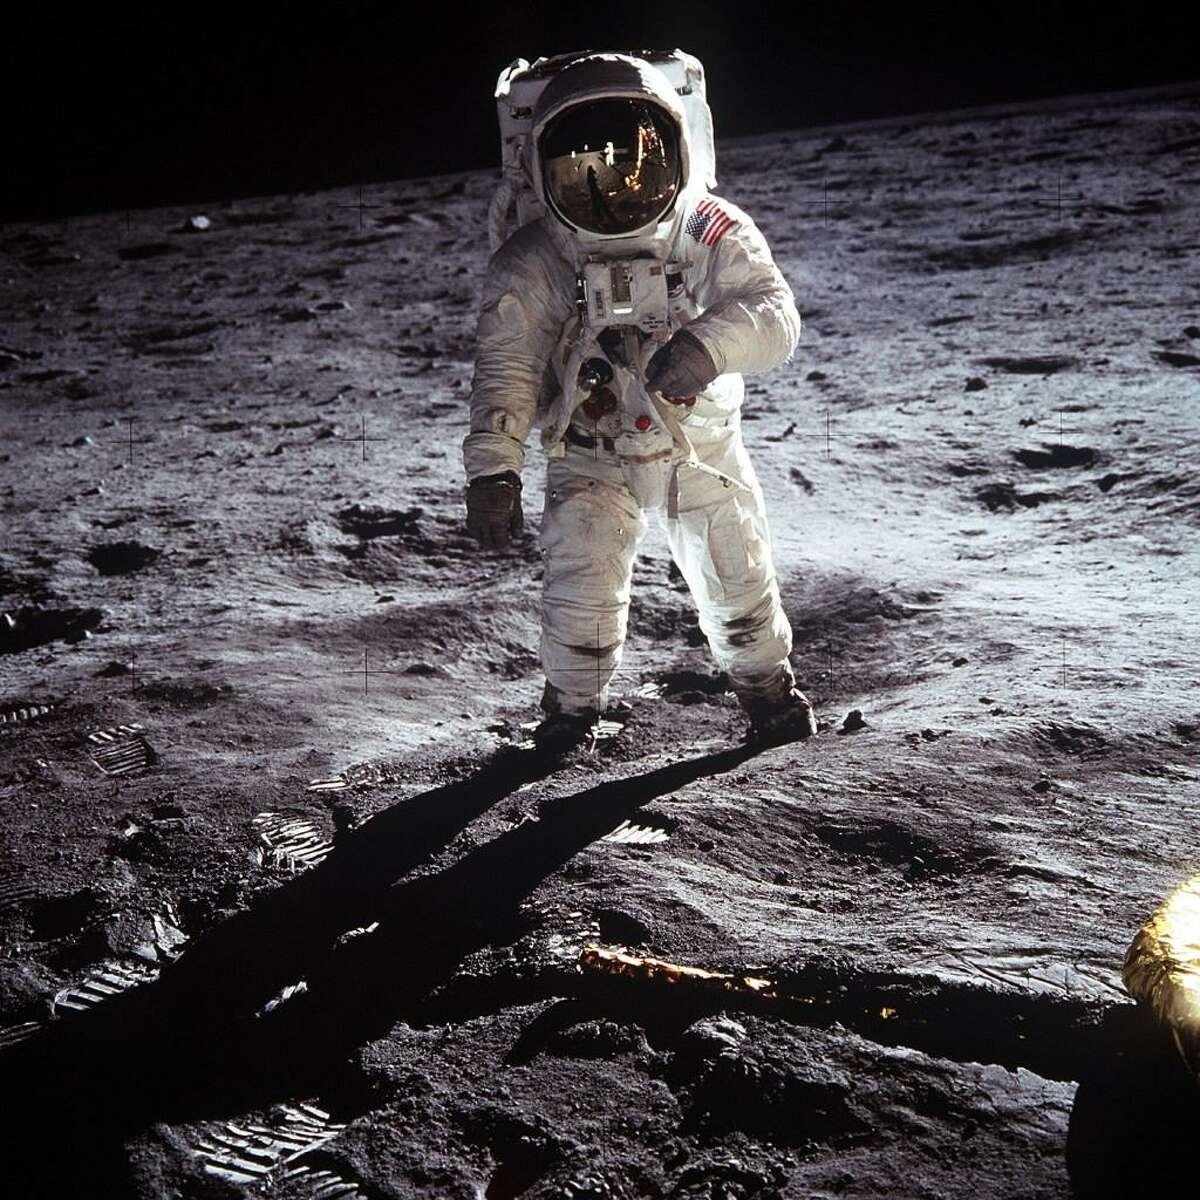 Buzz Aldrin walks on the moon.